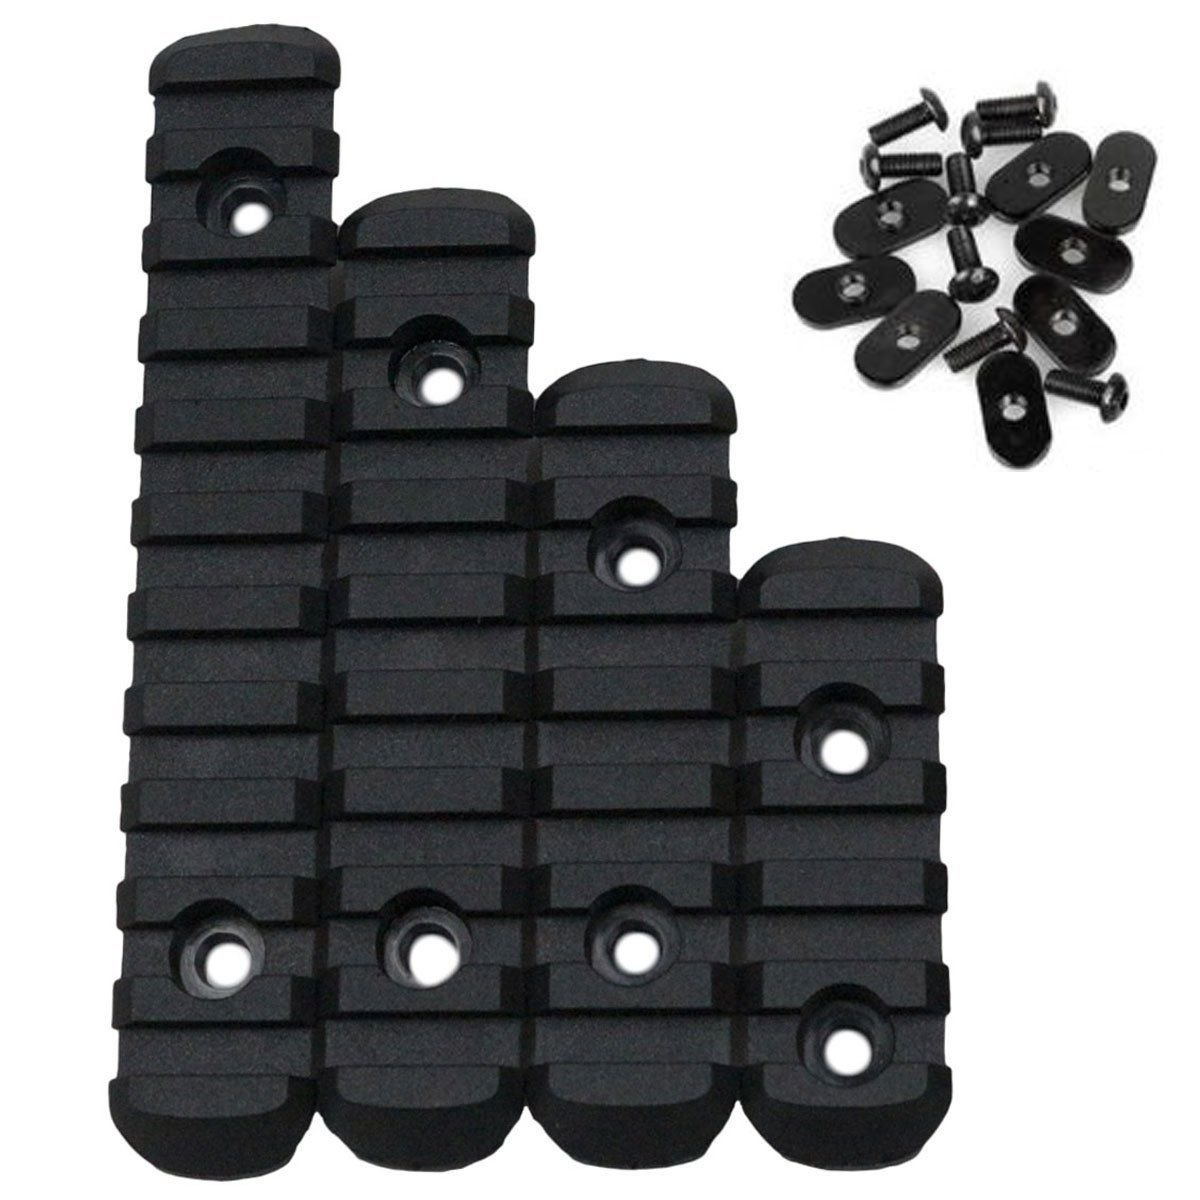 Black Tactical Advanced Polymer Rail Sheet Section Set for MOE Hand Guard Handguard